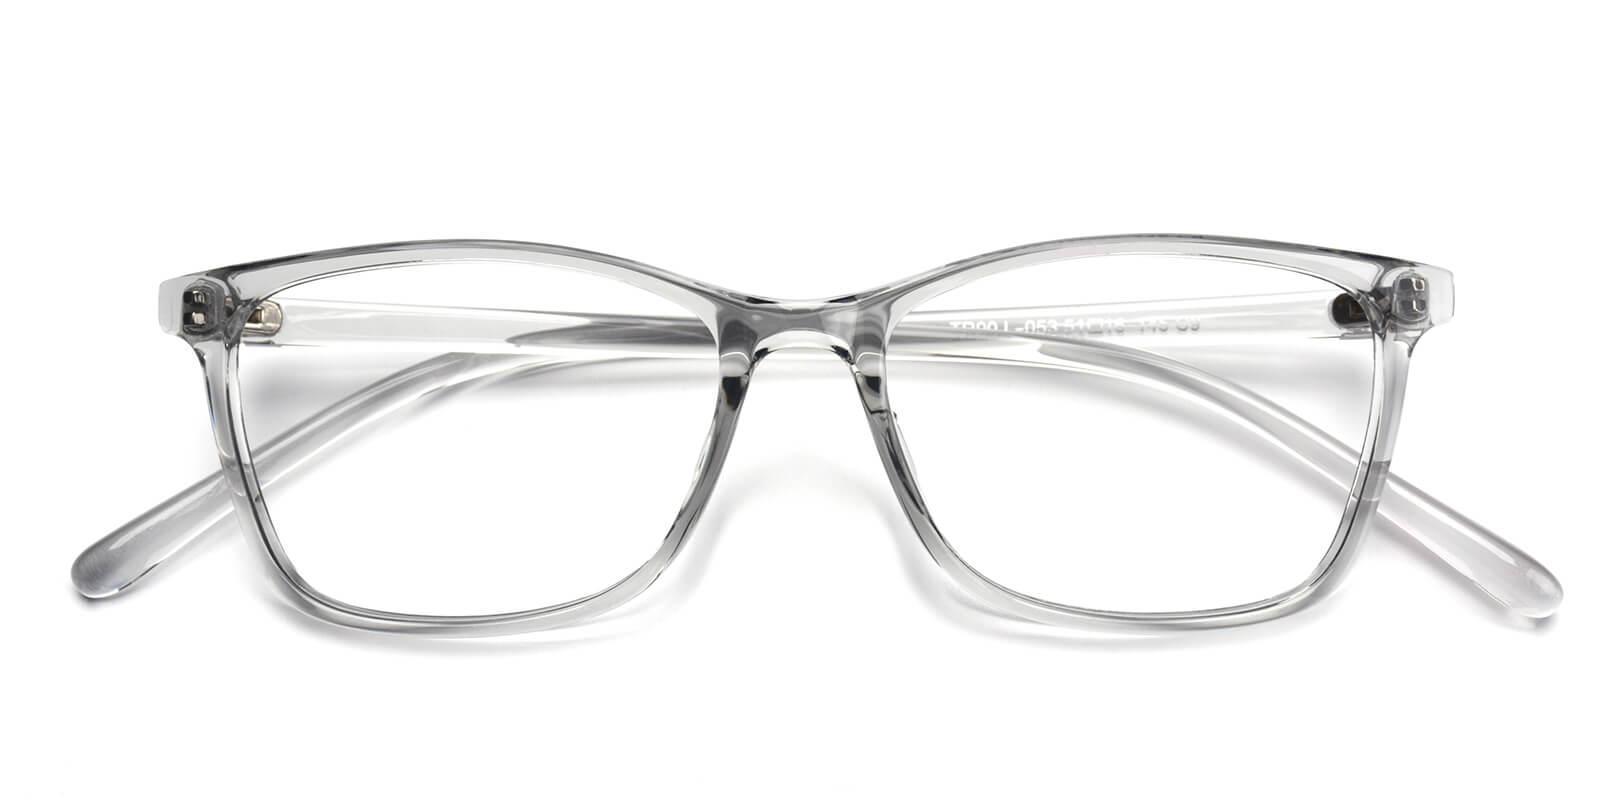 Suofia-Gray-Cat-TR-Eyeglasses-detail